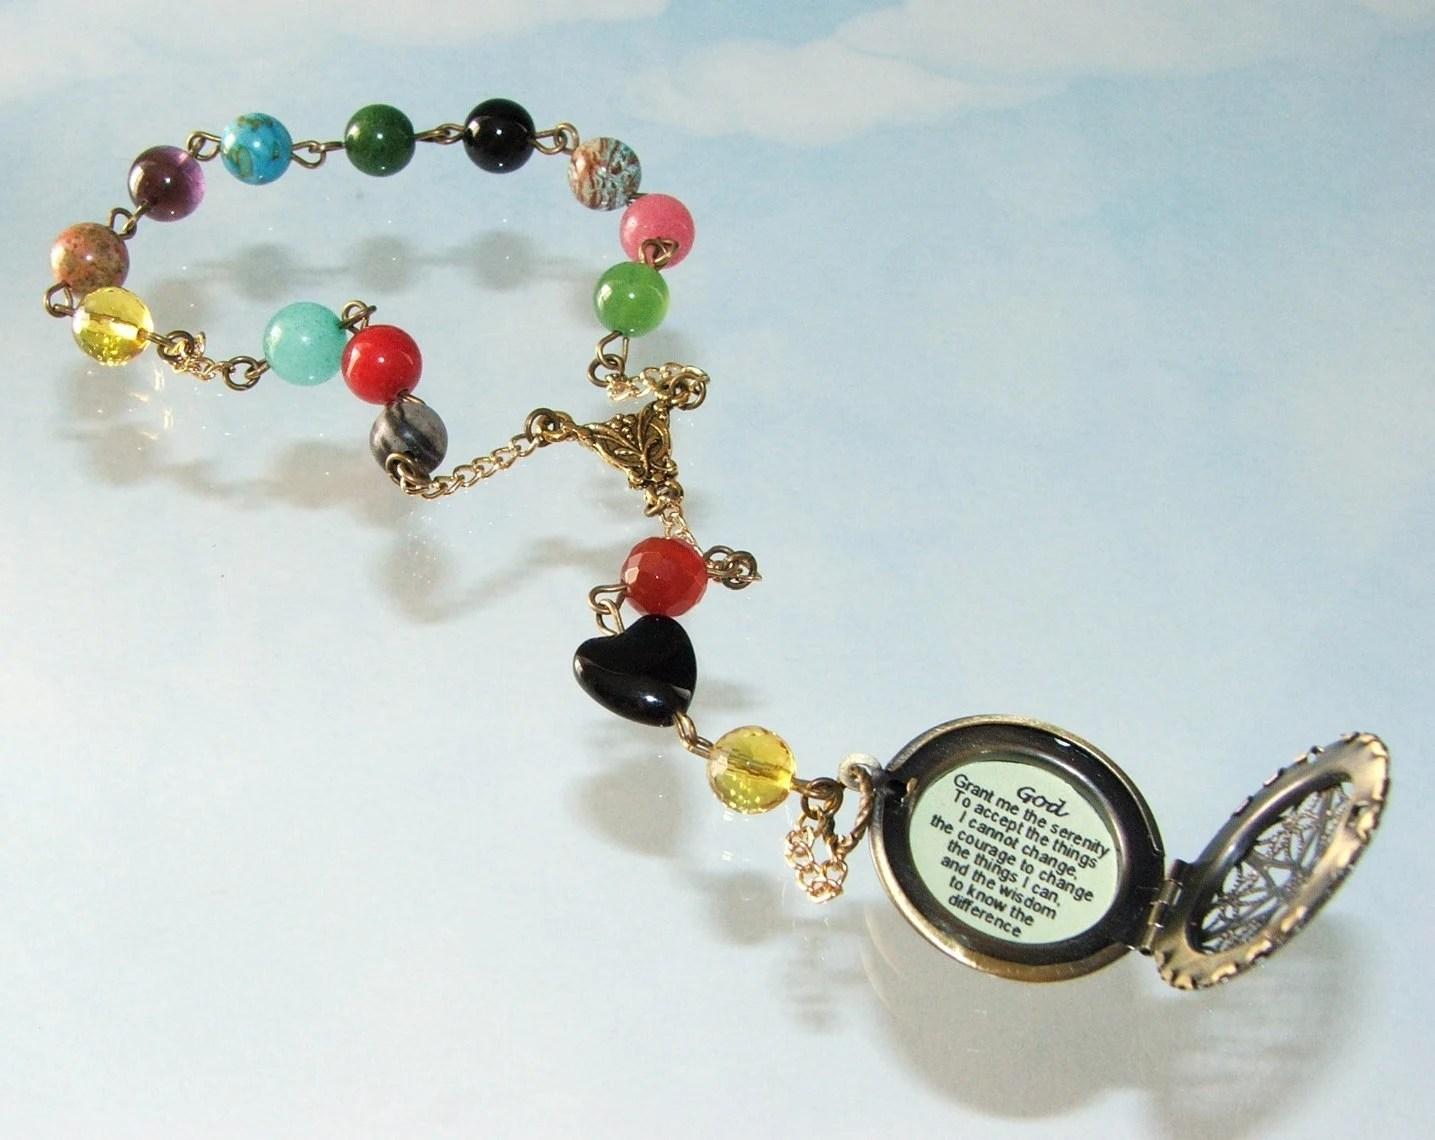 Serenity Prayer Beads Recovery 12 Step Beads